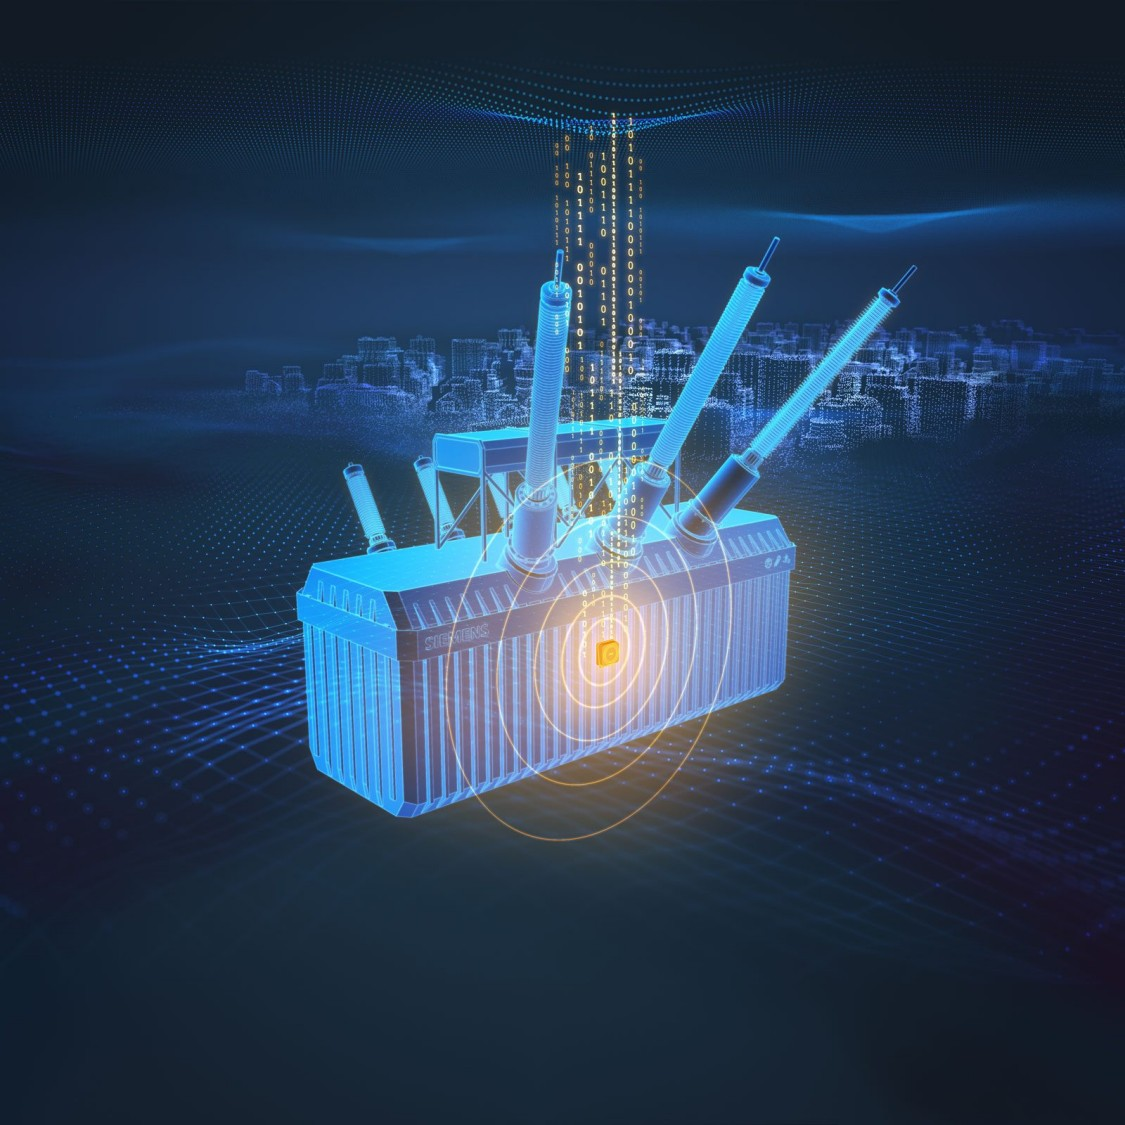 Sensformer: Transformers meet connectivity